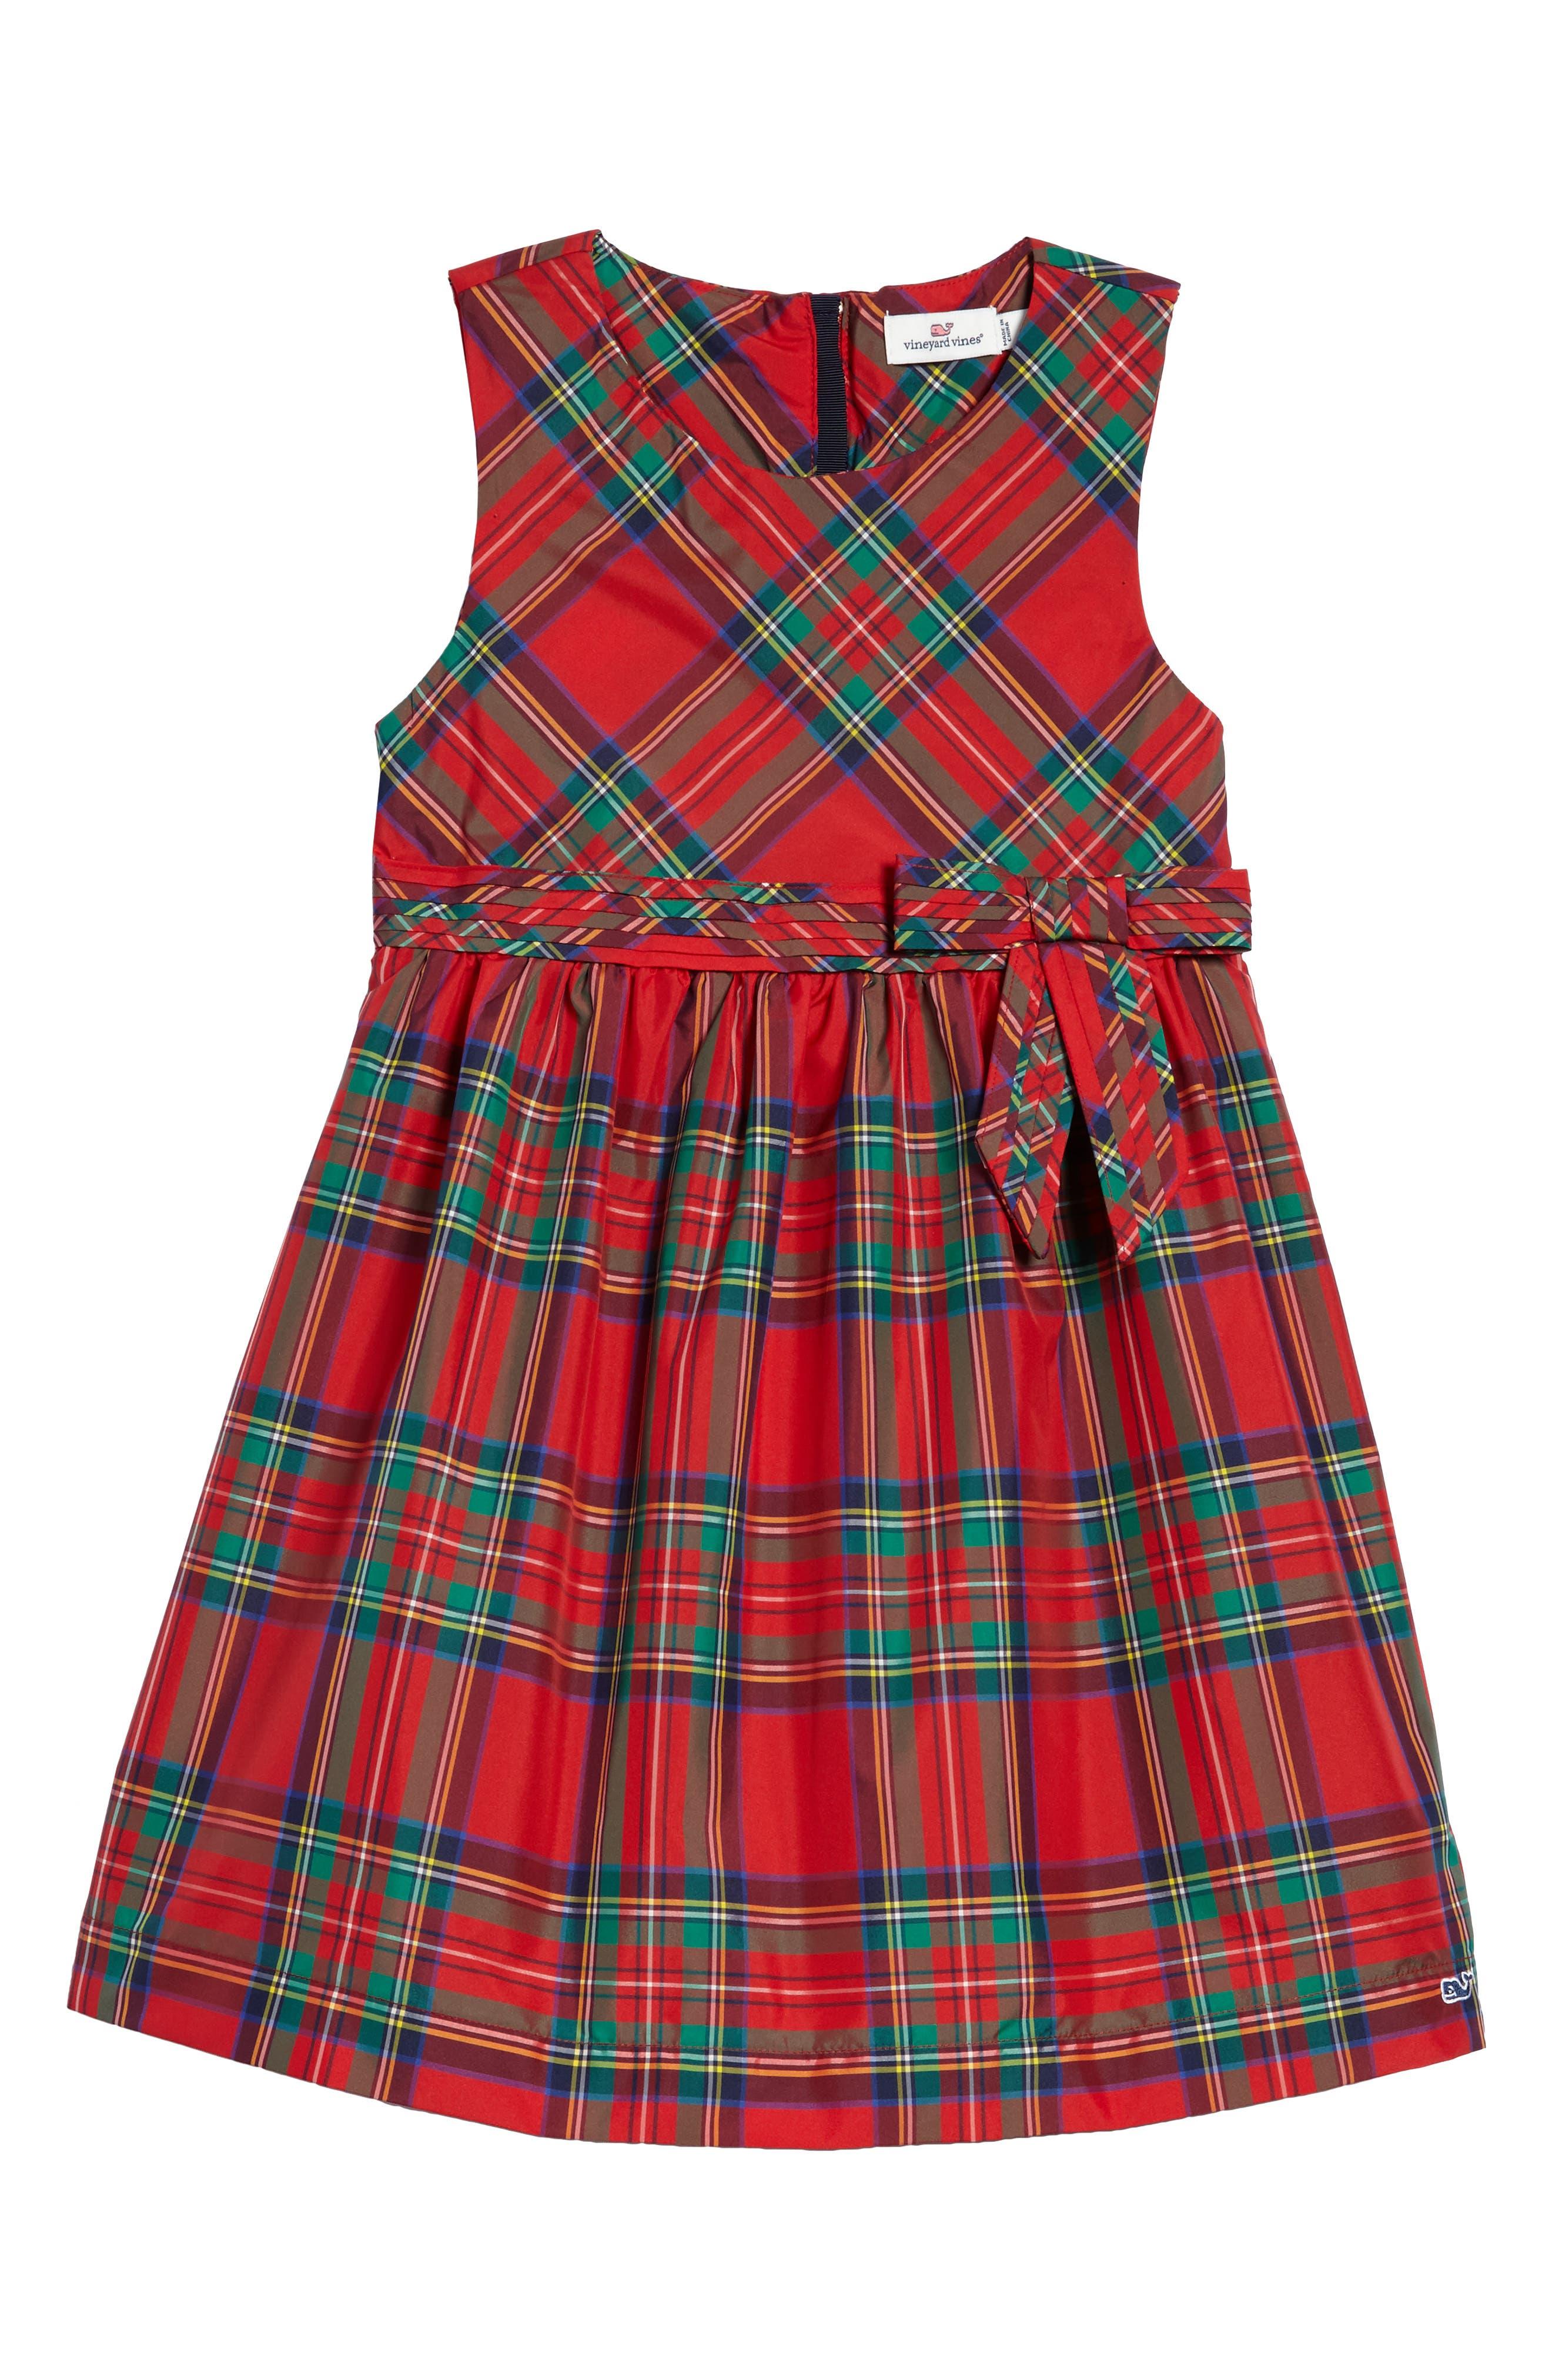 vineyard vines Jolly Plaid Holiday Dress (Toddler Girls, Little Girls & Big Girls)